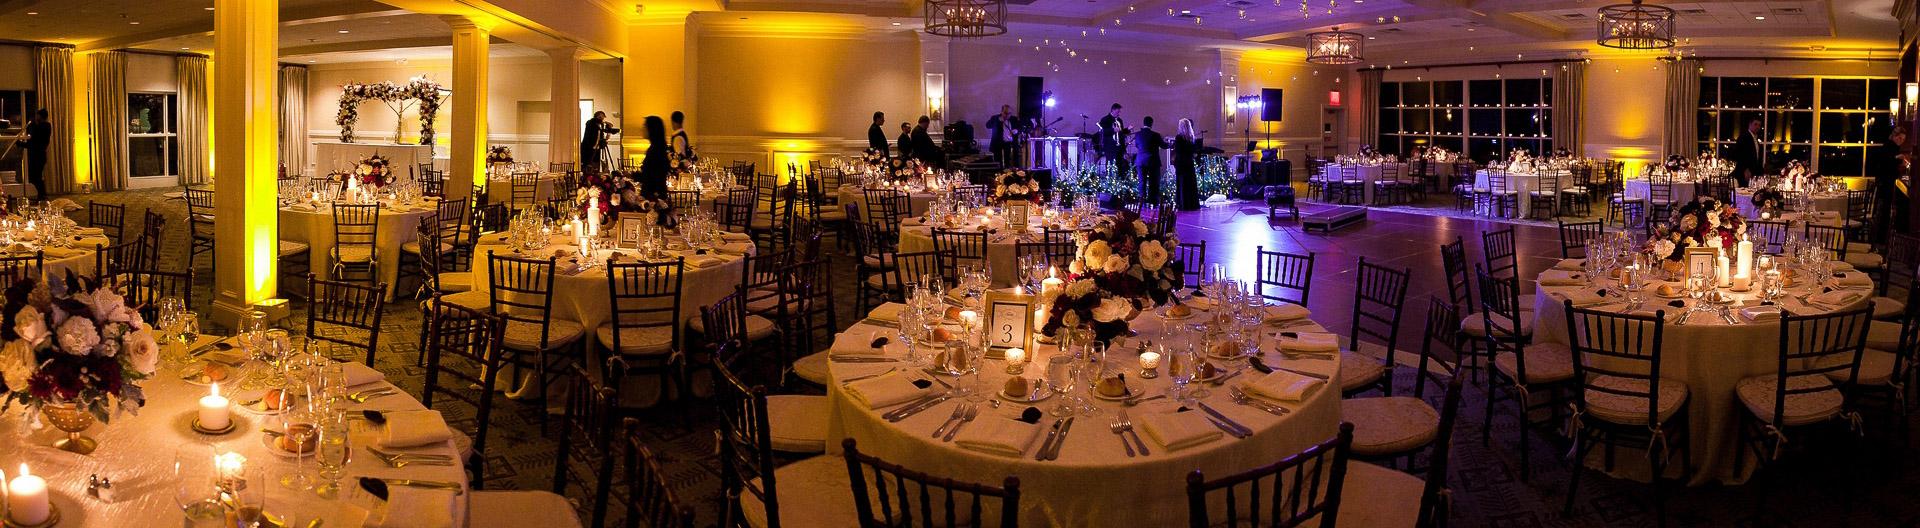 Paramount Country Club Wedding Room Shot Decor Flowers